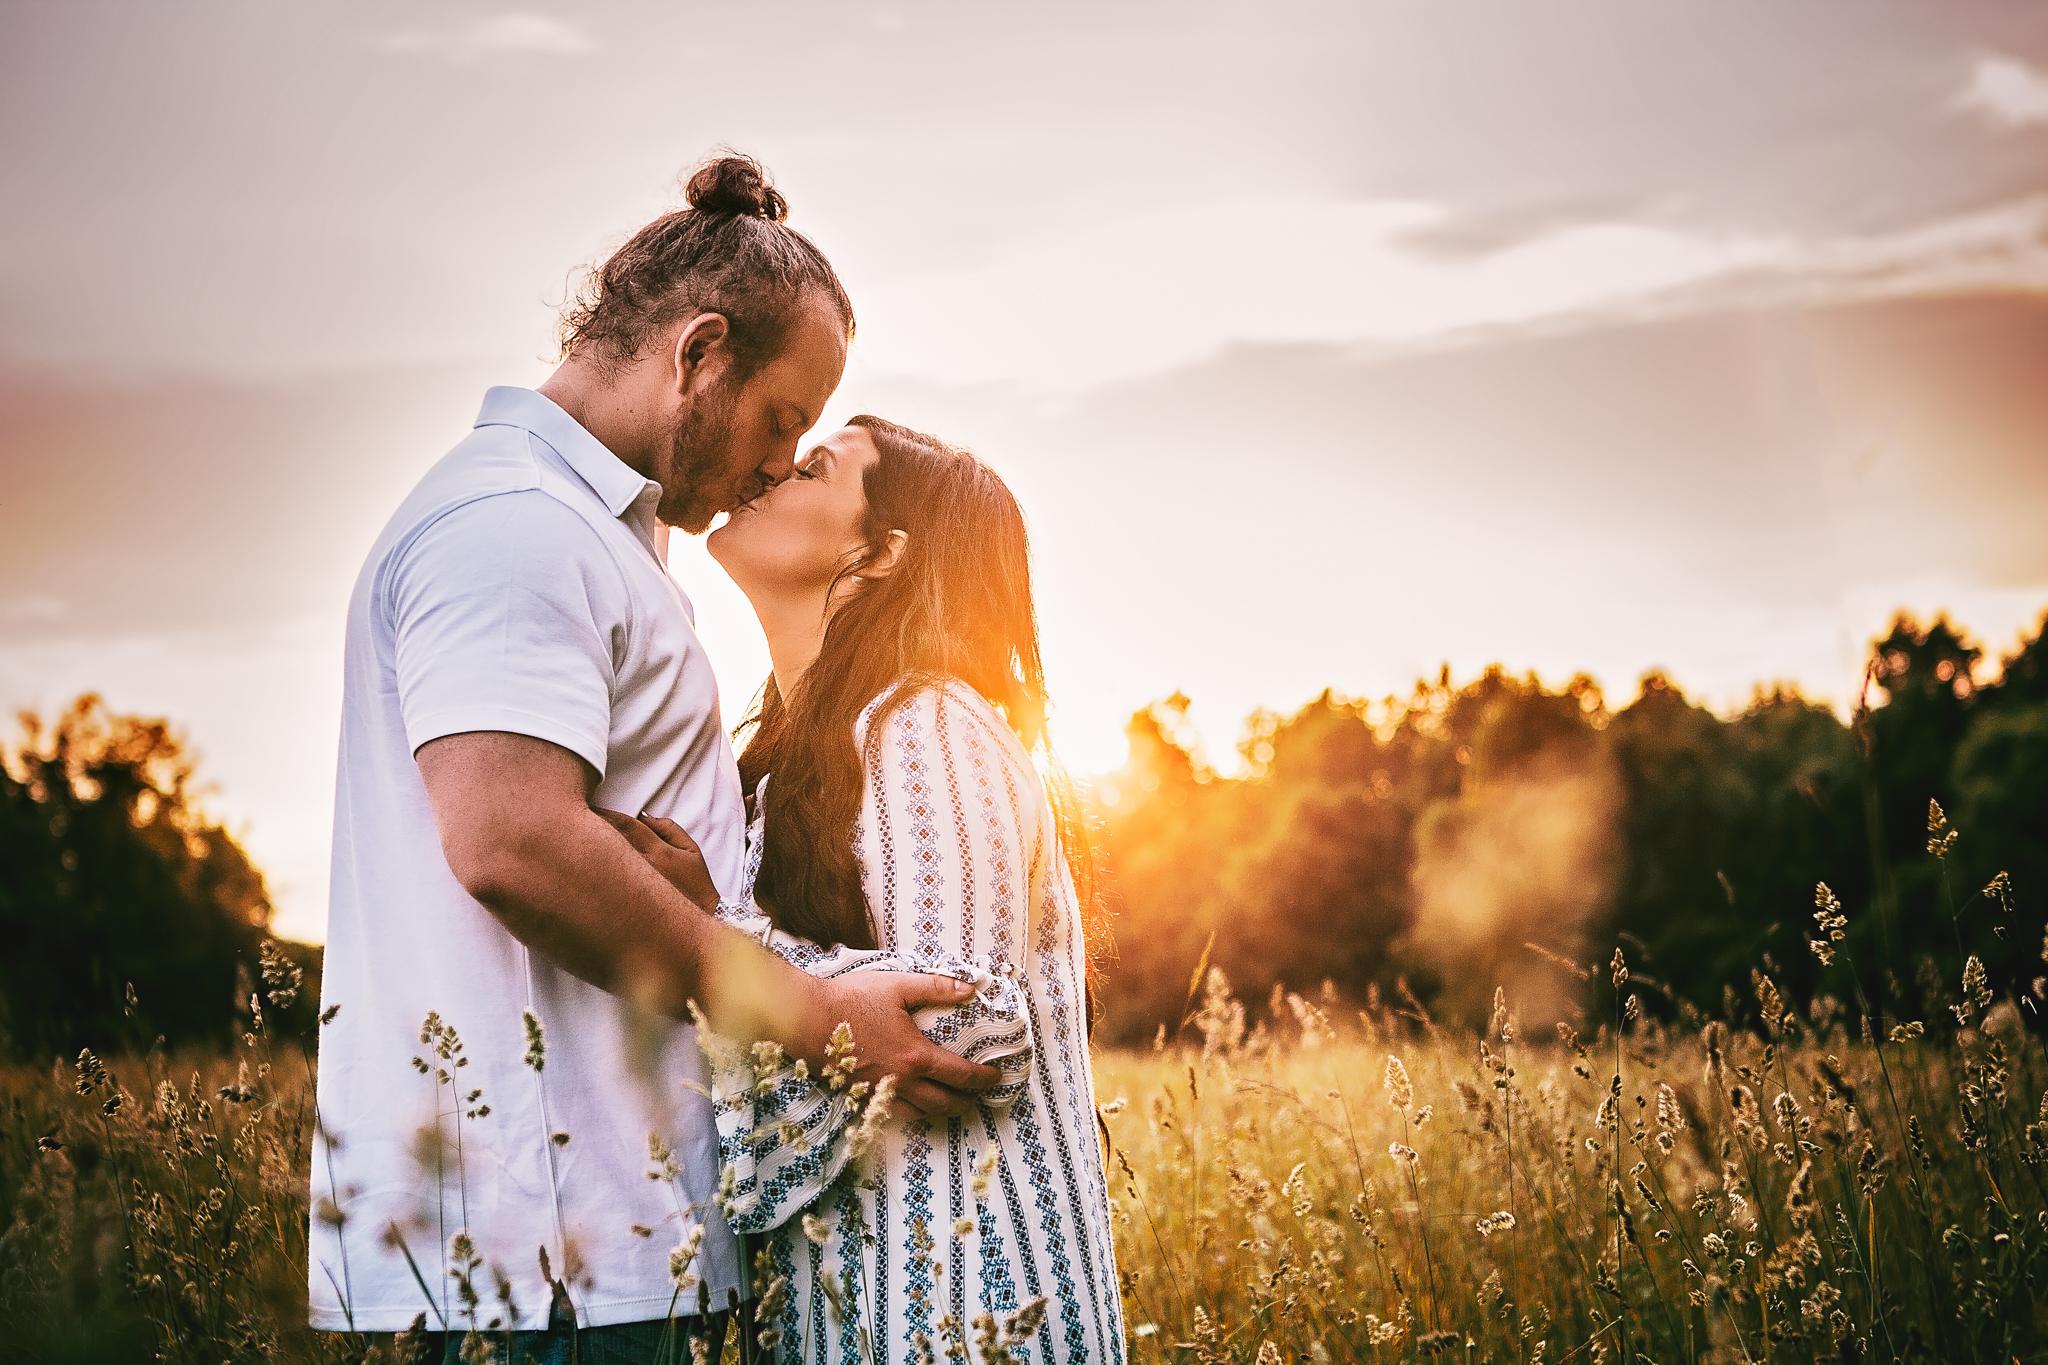 Richmond Kentucky Engagement Photographer - Ariana Jordan Photography -3.jpg